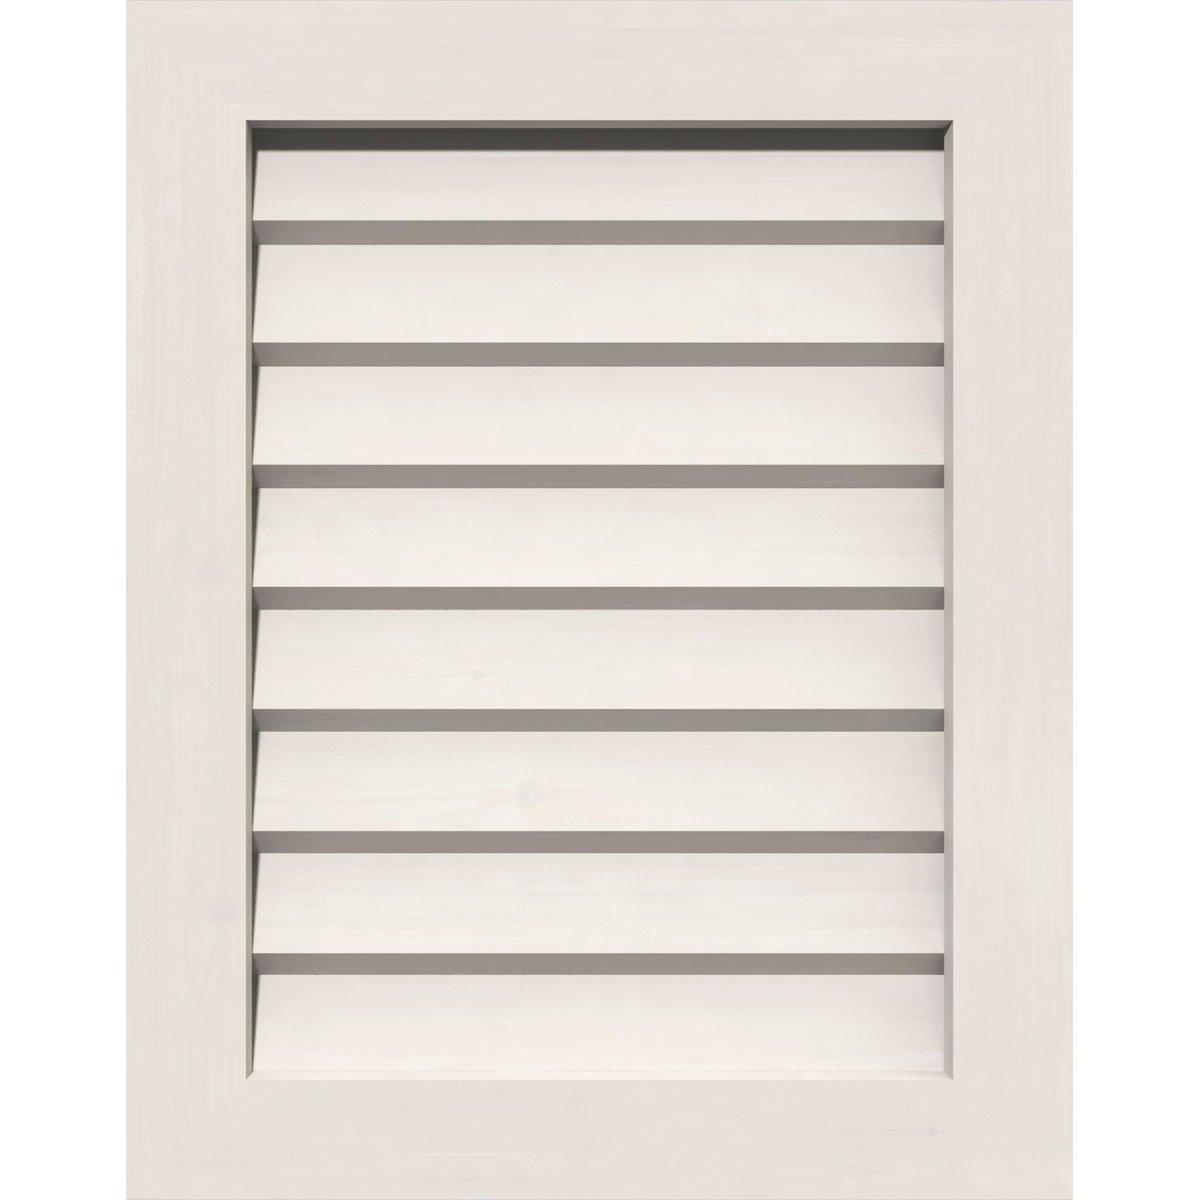 Ekena Millwork GVPVE22X1601DUN Pac Gable Vent, 22'' W X 16'' H (27'' W X 21'' H Frame Size), White